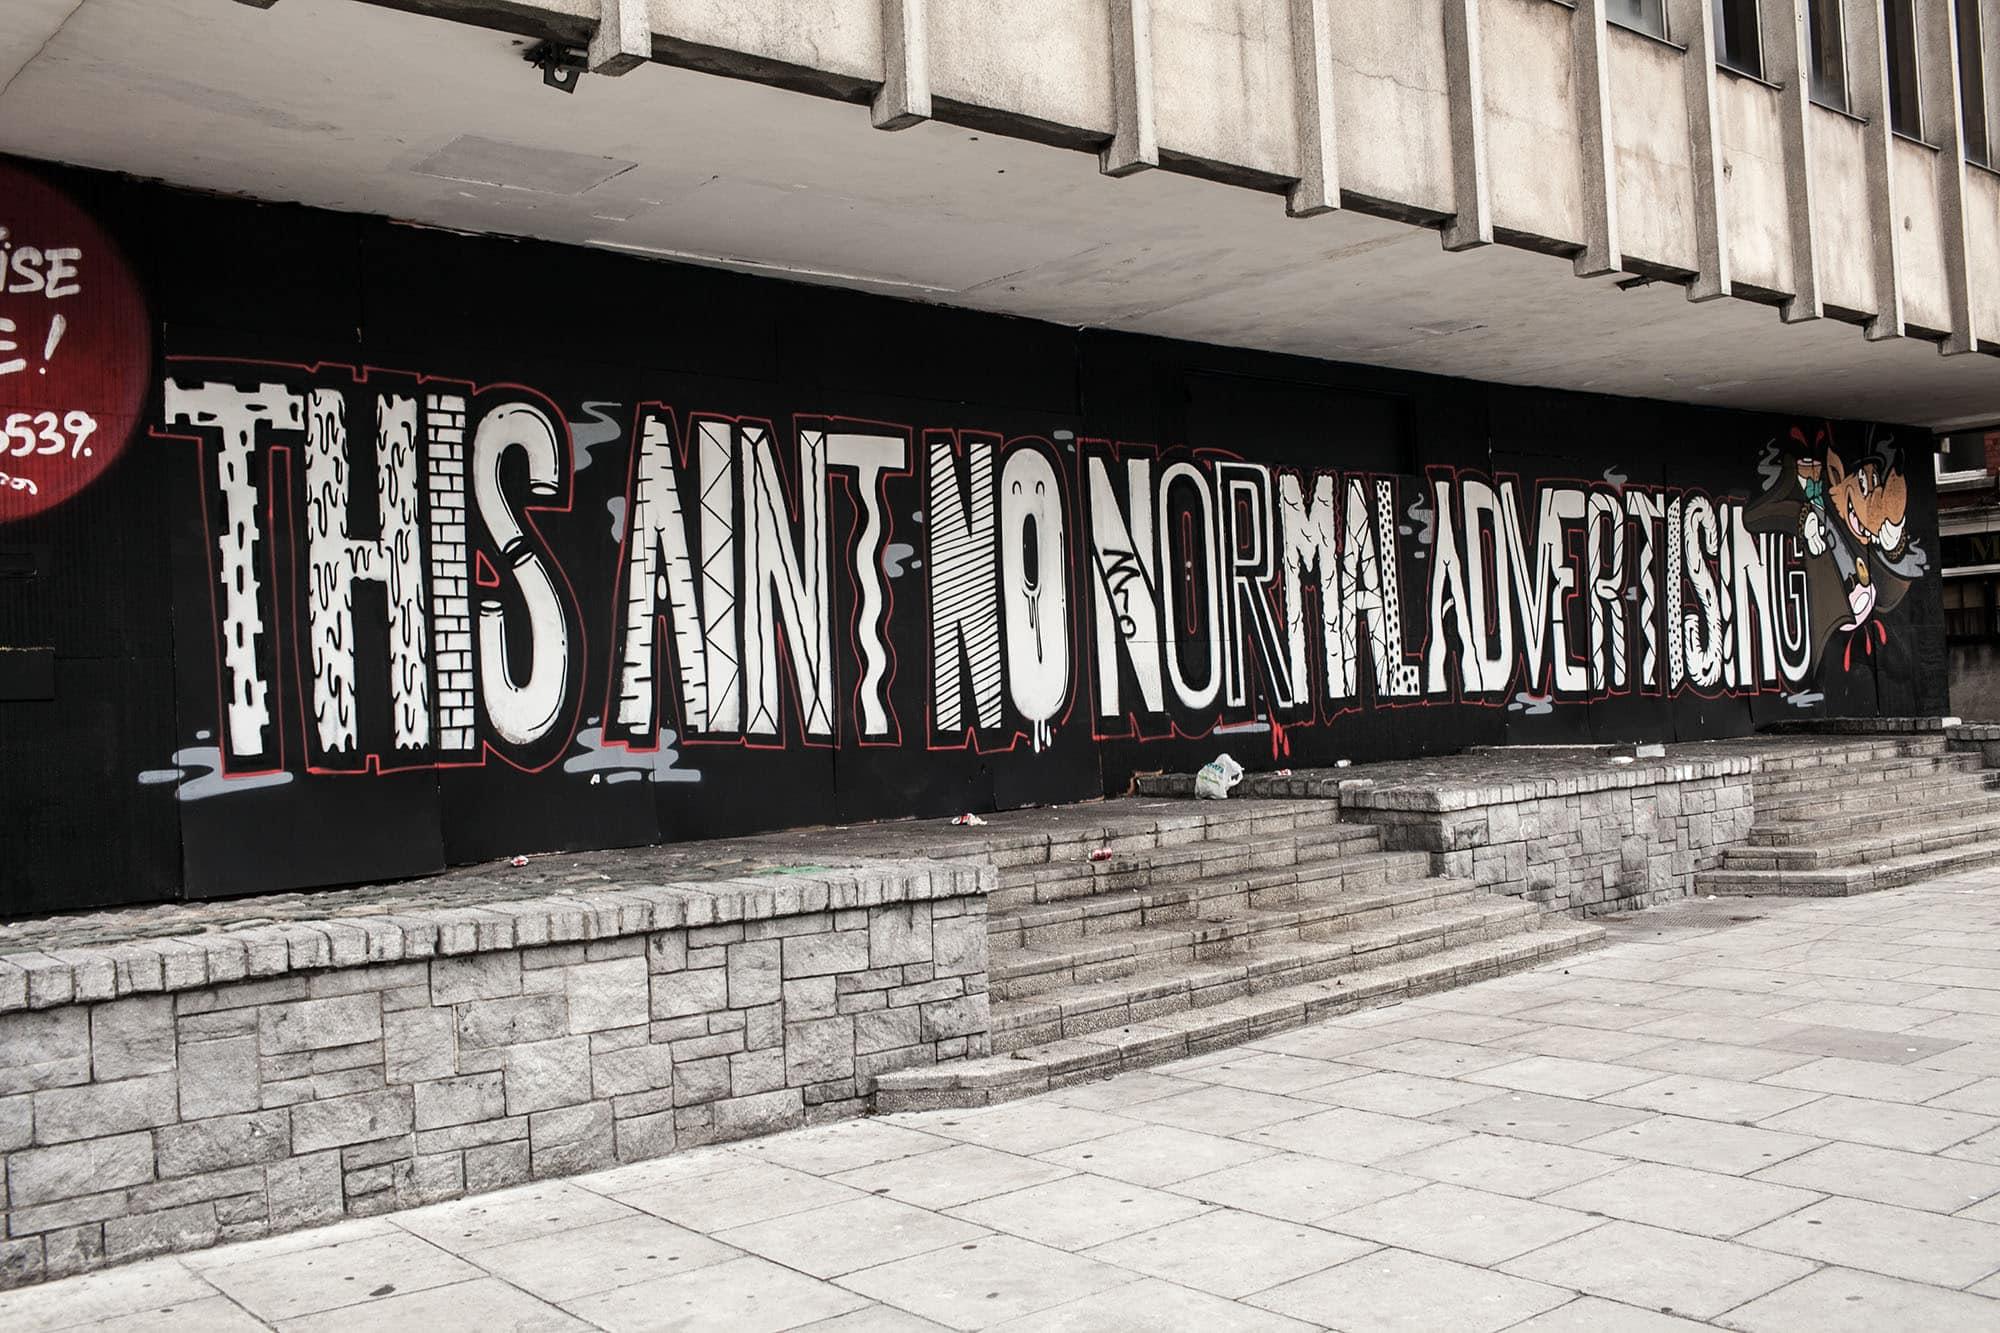 This Aint No Normal Advertising - Dublin, Ireland